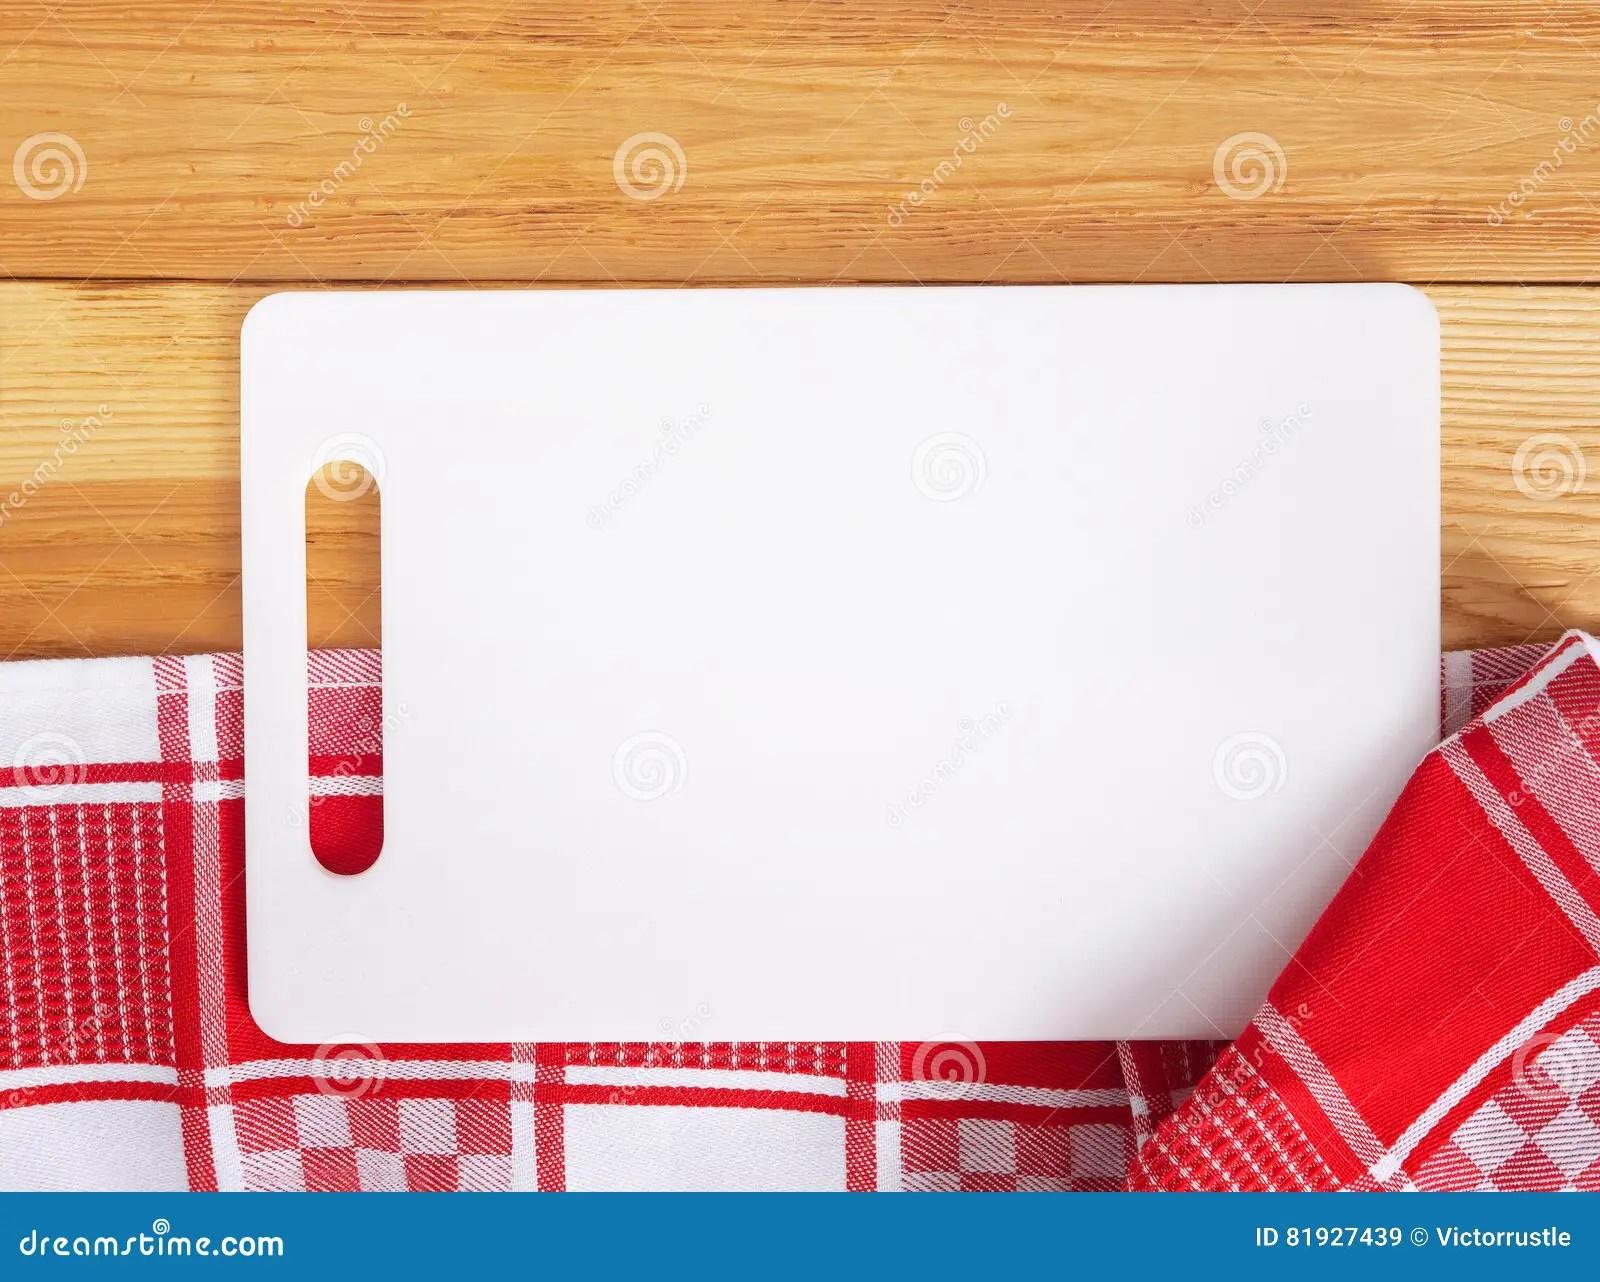 towel for kitchen fire suppression system 在毛巾的切板在木厨房用桌上顶视图库存图片 图片包括有背包 顶层 菜单 倒空在毛巾的白色切板在木厨房用桌上顶视图